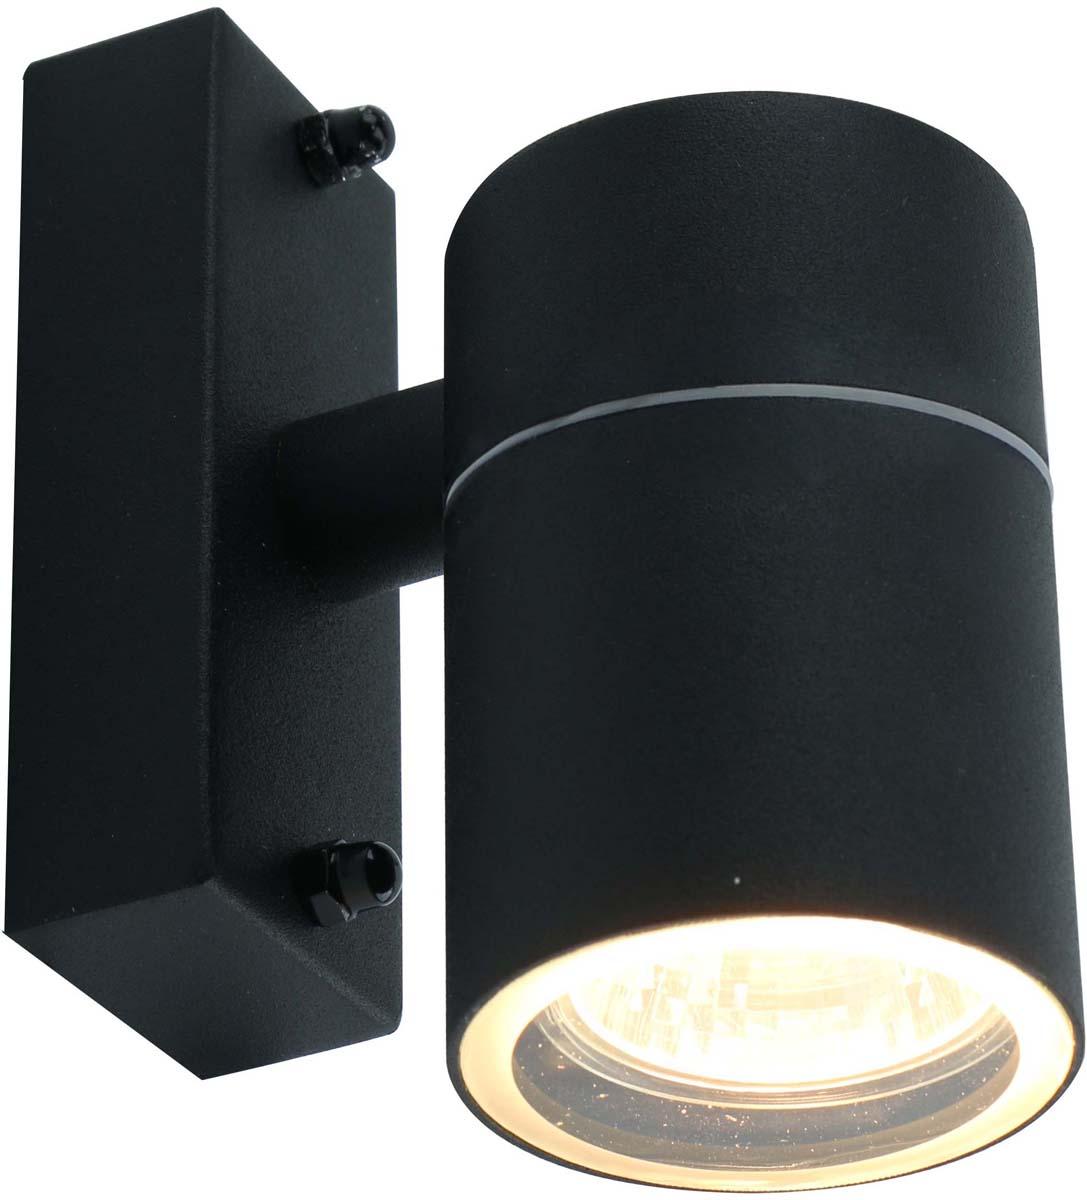 Светильник уличный Arte Lamp Mistero, цвет: черный, 1 х GU10, 50 W. A3302AL-1BK